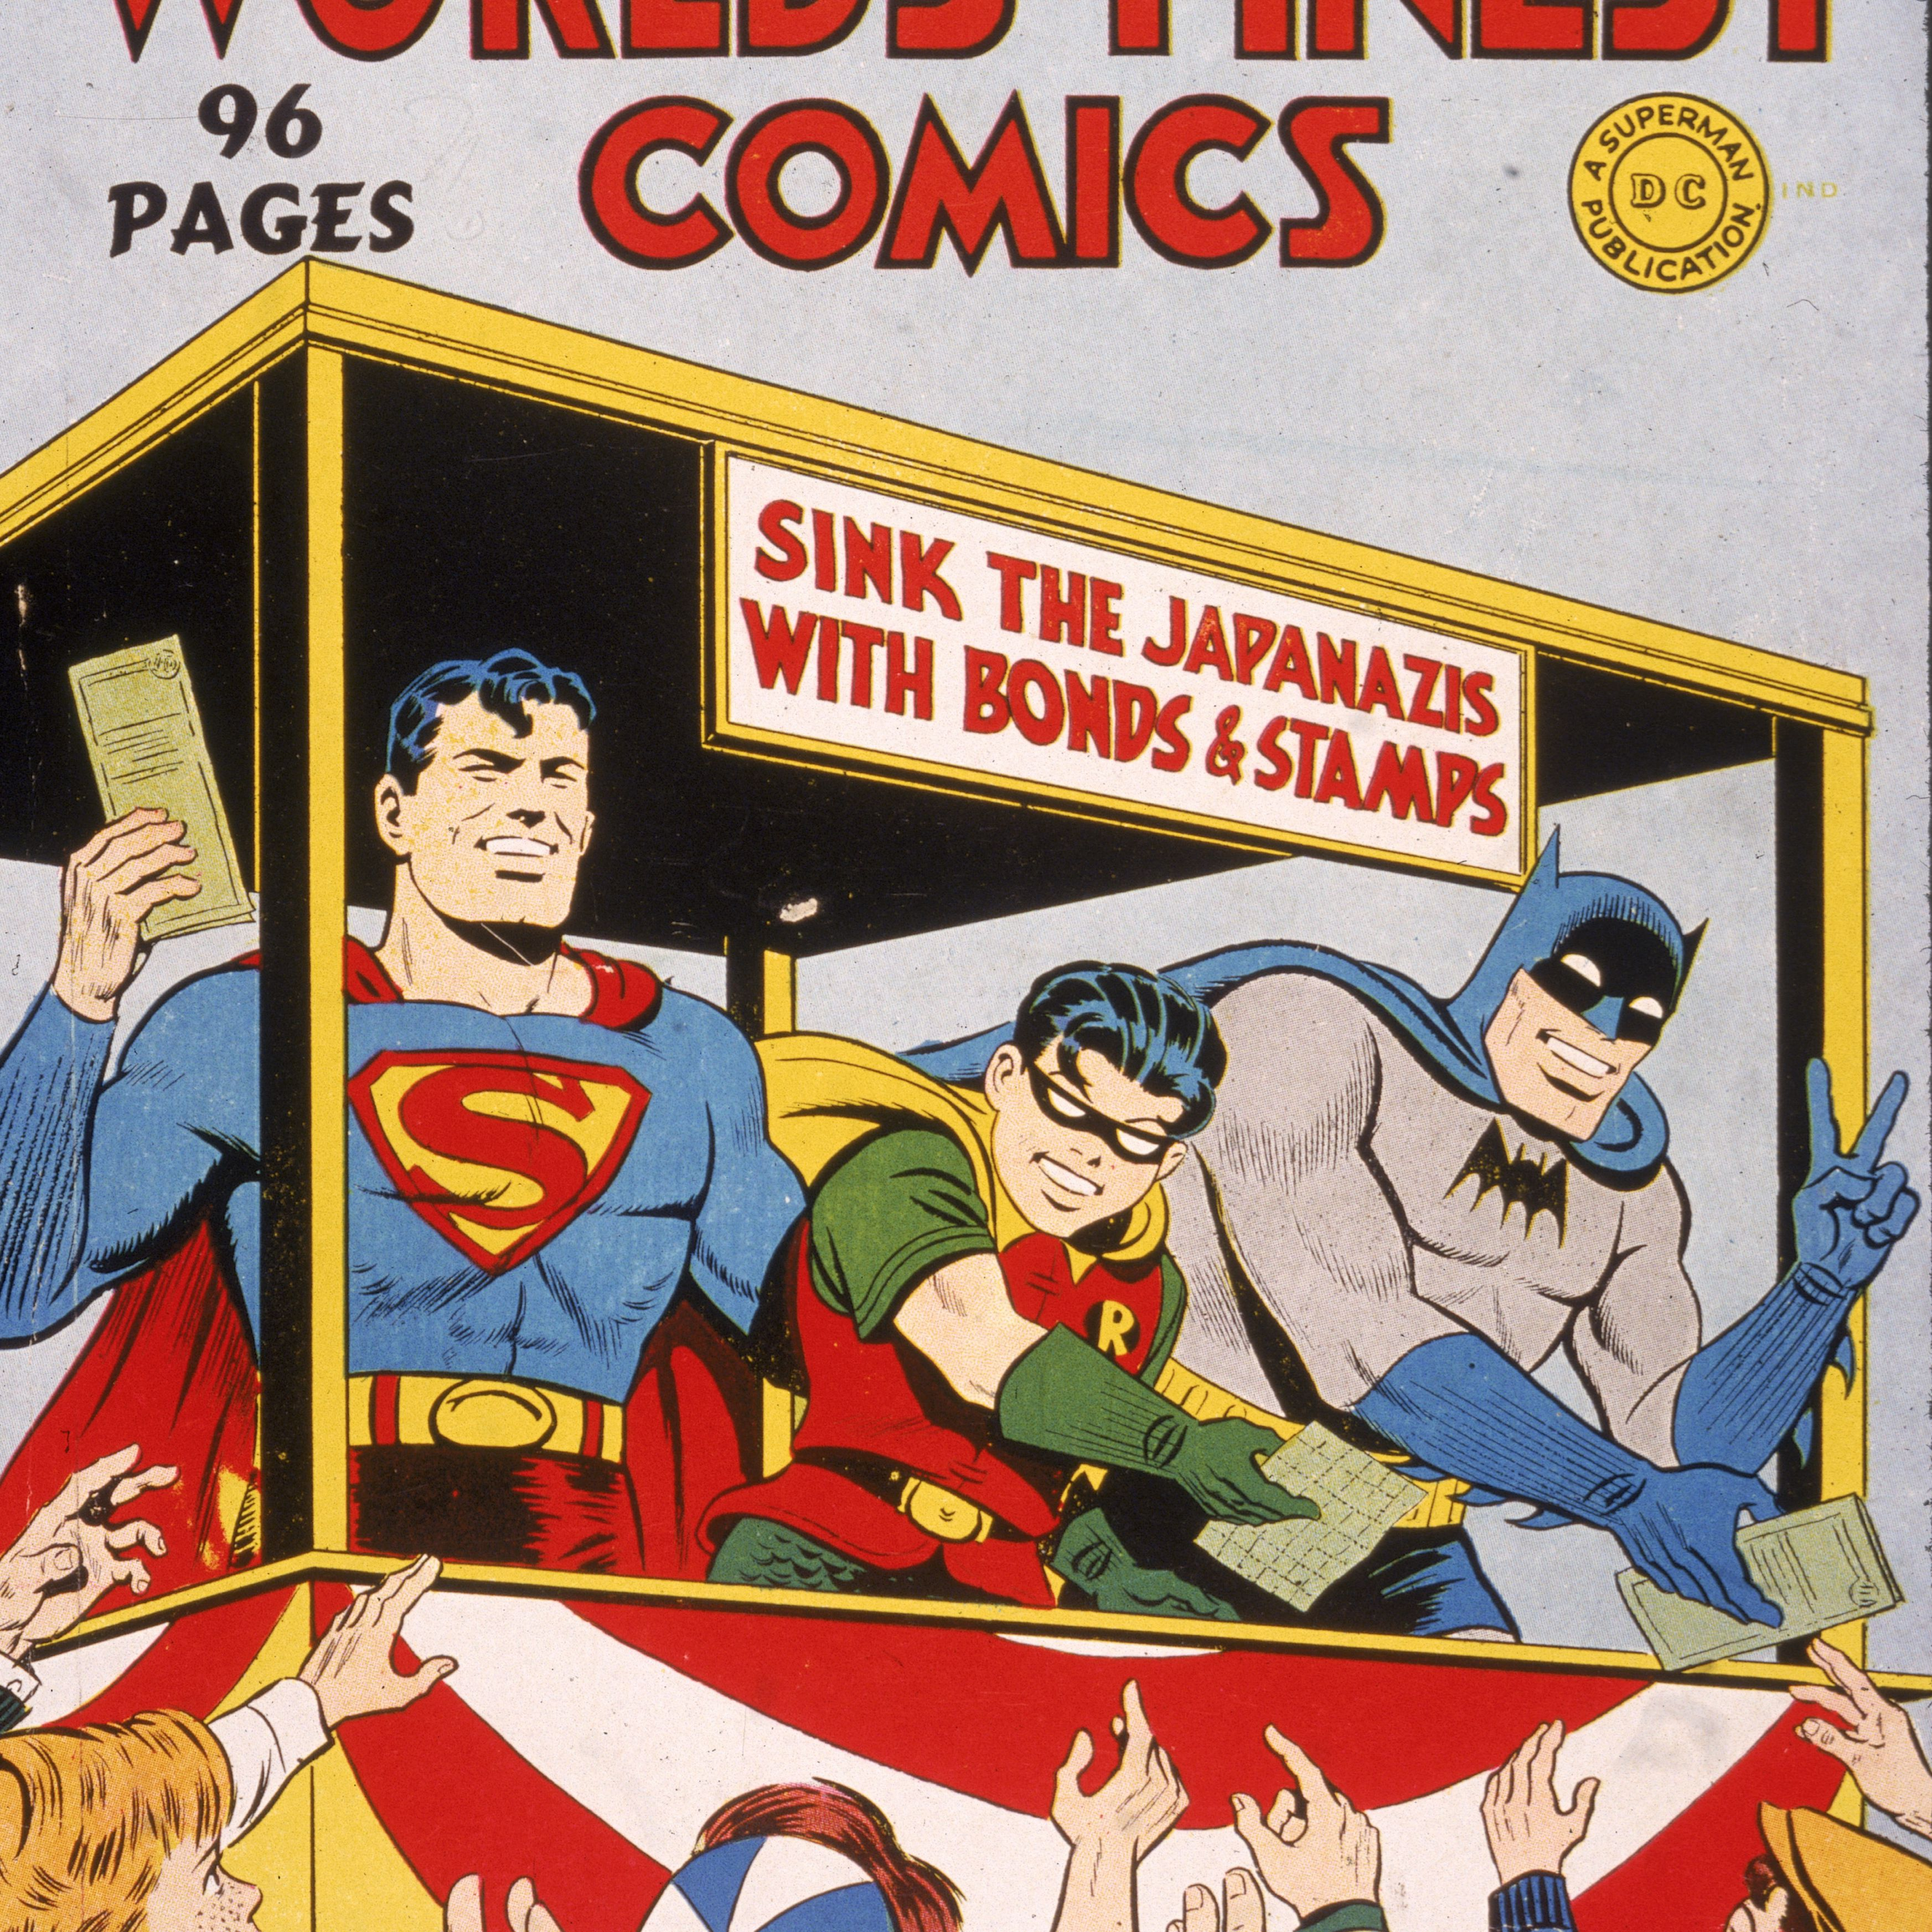 'World's Finest Comics,' with Superman, Batman and Robin selling US War Bonds to sink the 'Japanazis' in World War II,